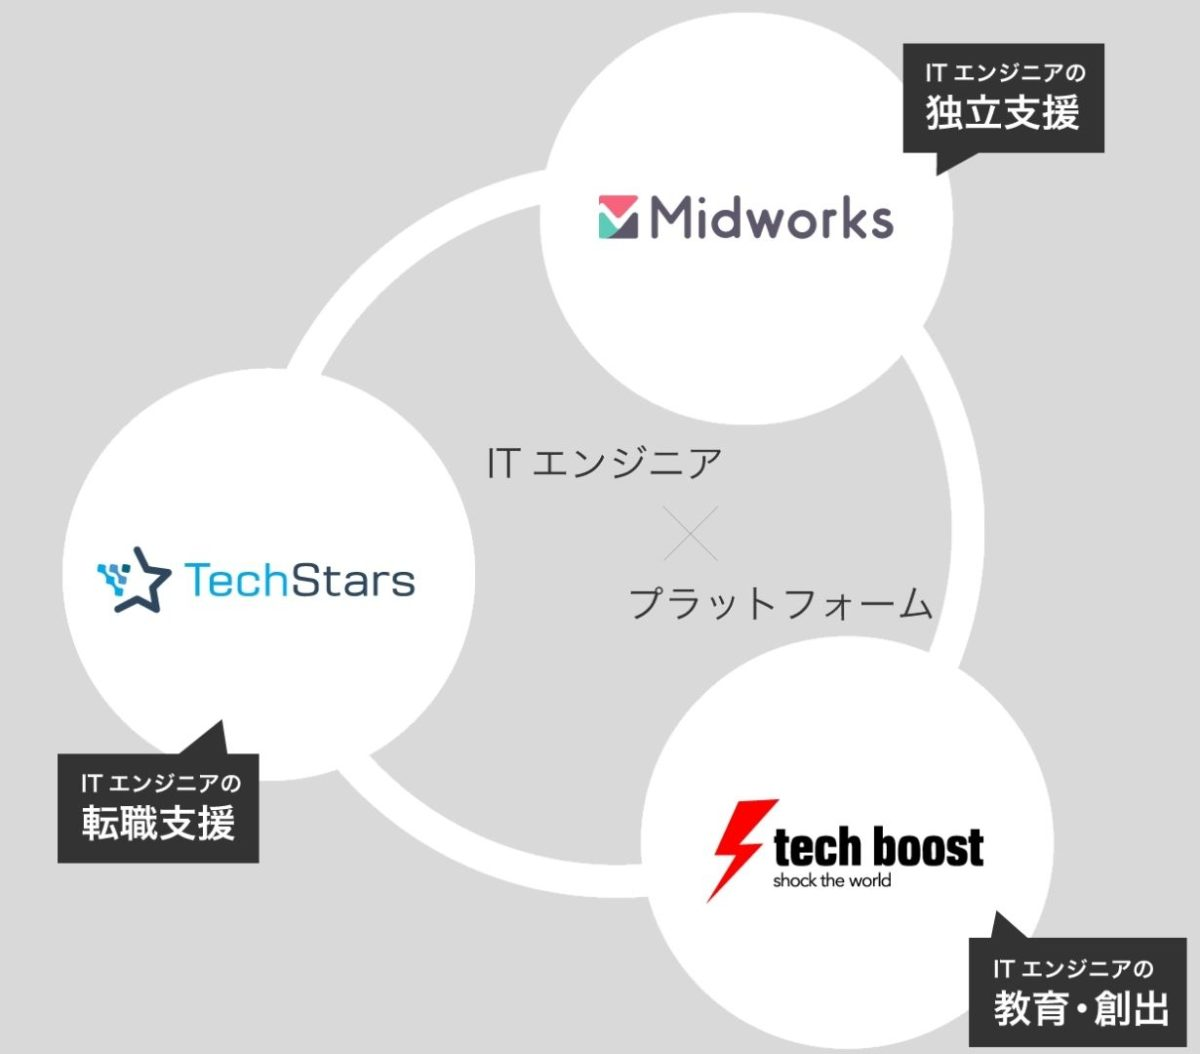 出典:株式会社Branding Engineer(https://b-engineer.co.jp/)